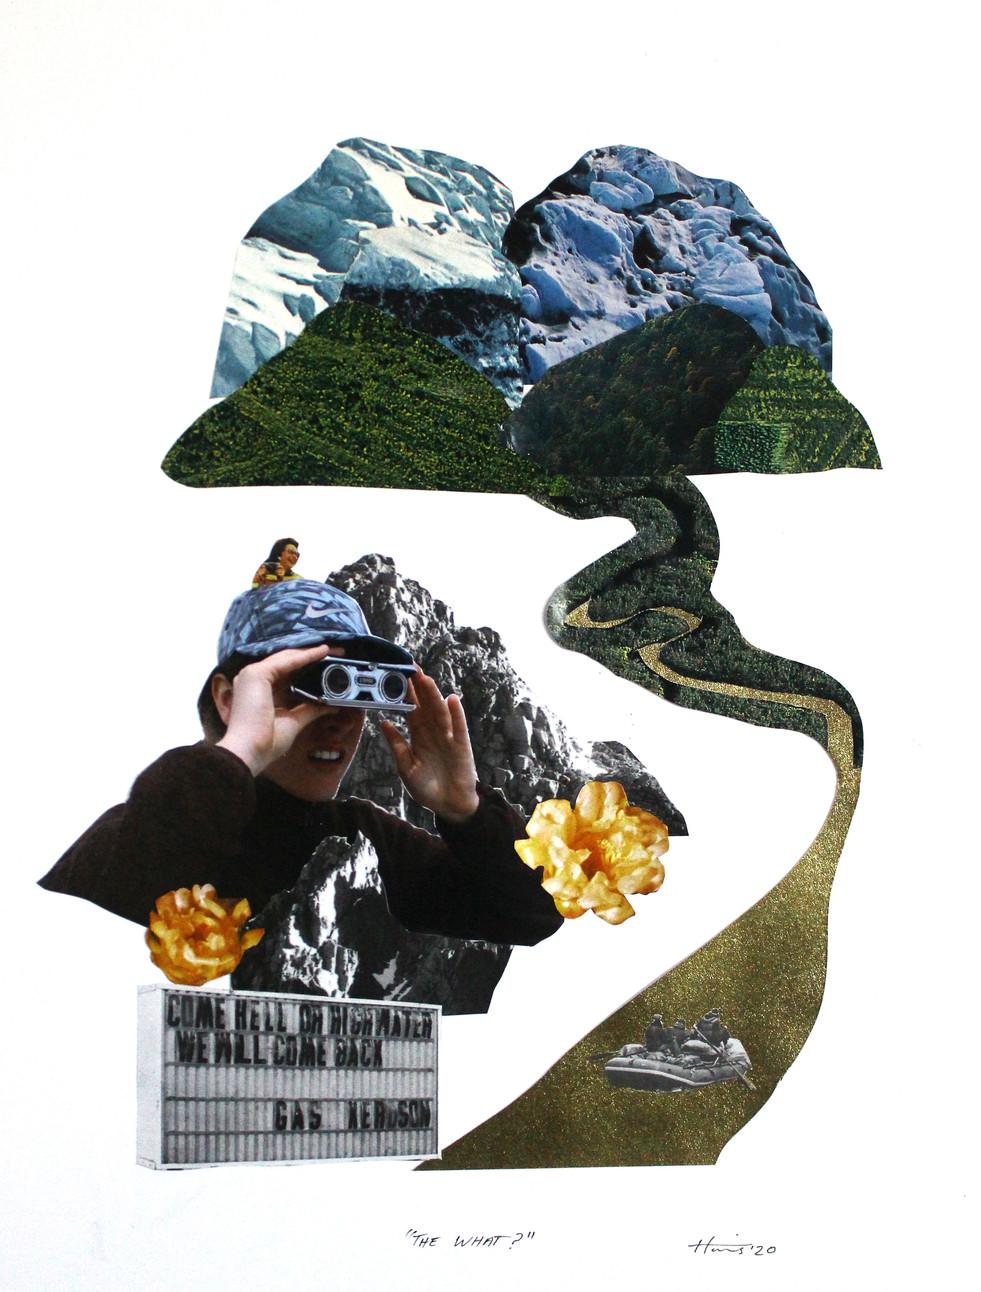 Custom collage